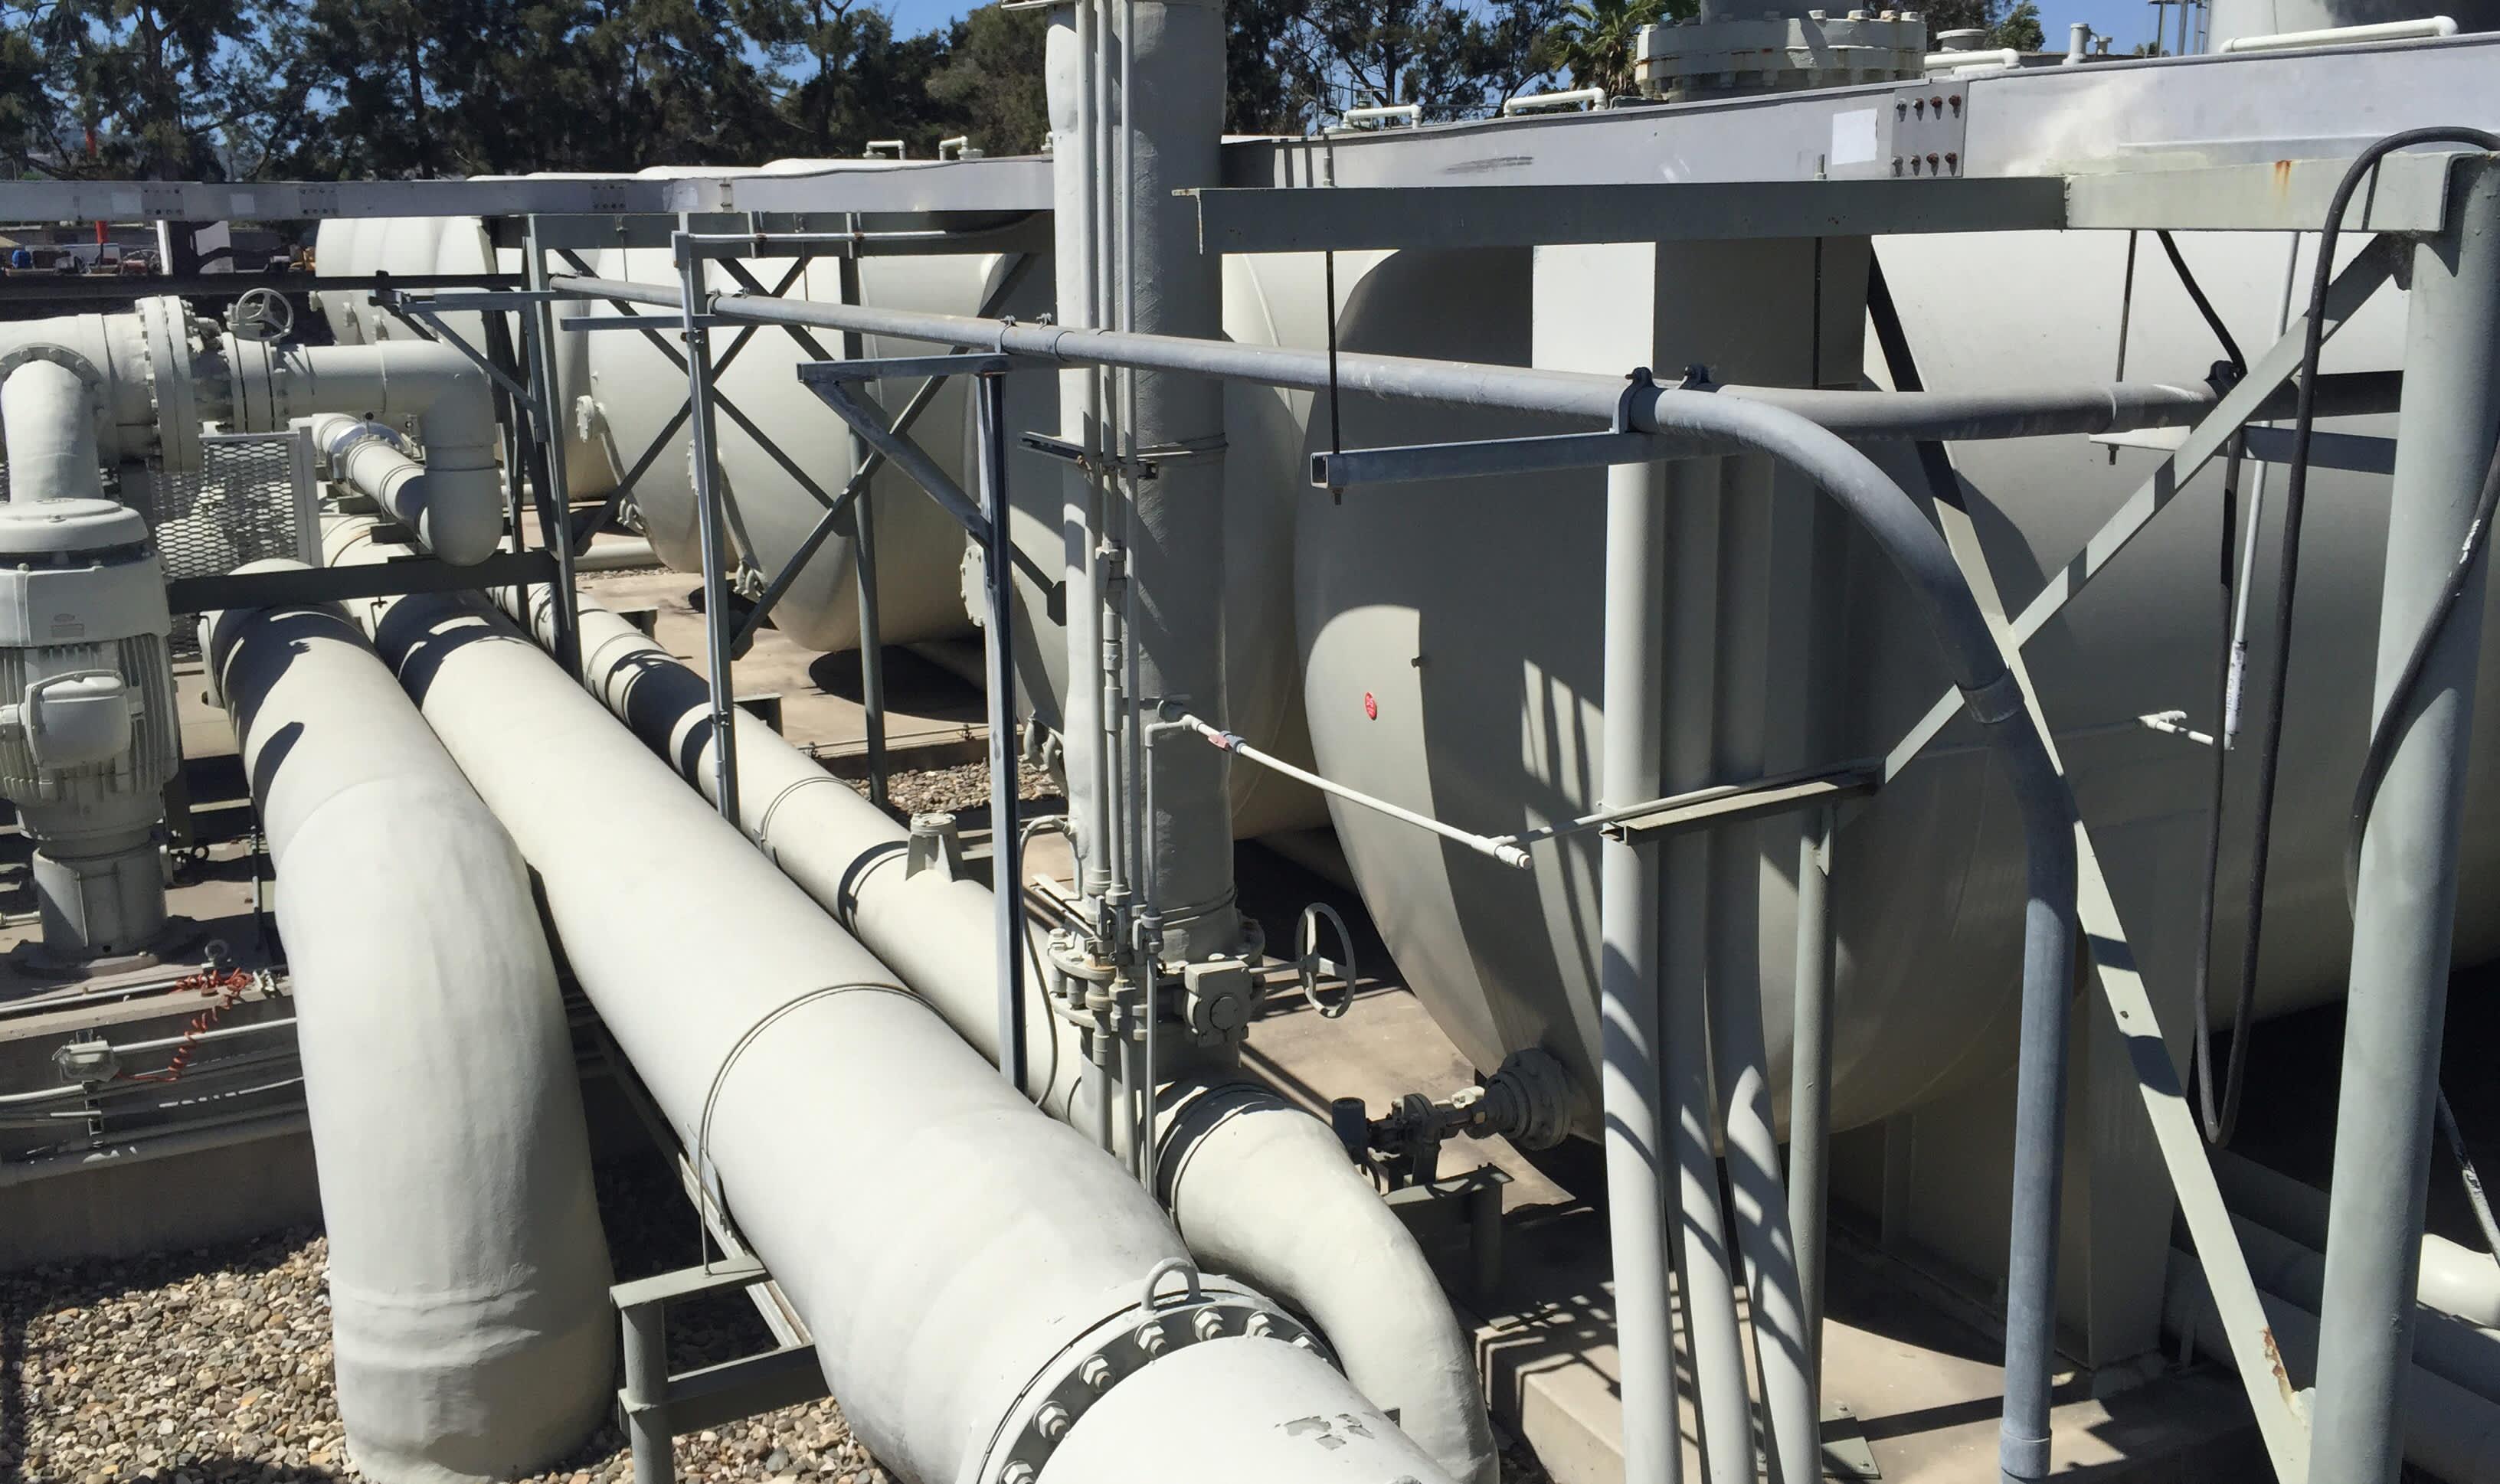 Santa Barbara hopes desalination will help it beat drought